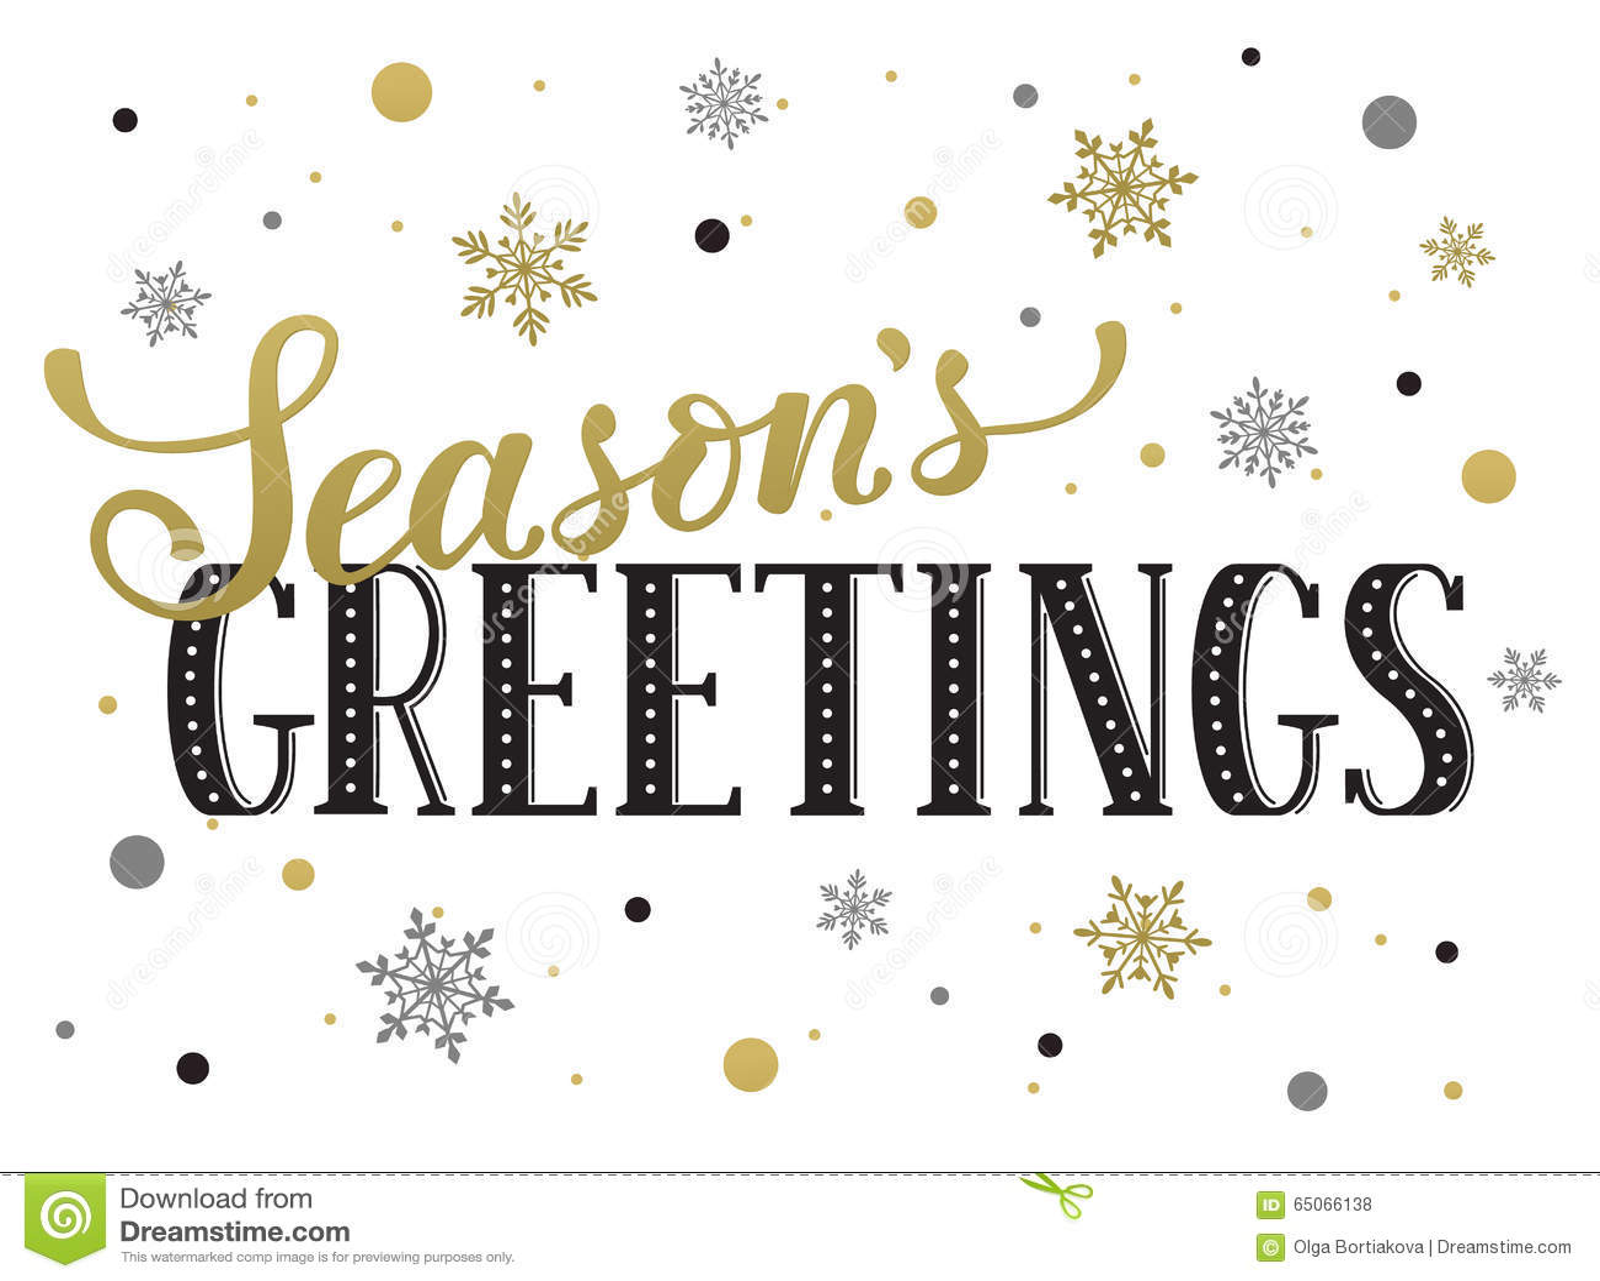 Seasons Greetings Card Stock Vector Illustration Of Postcard 65066138